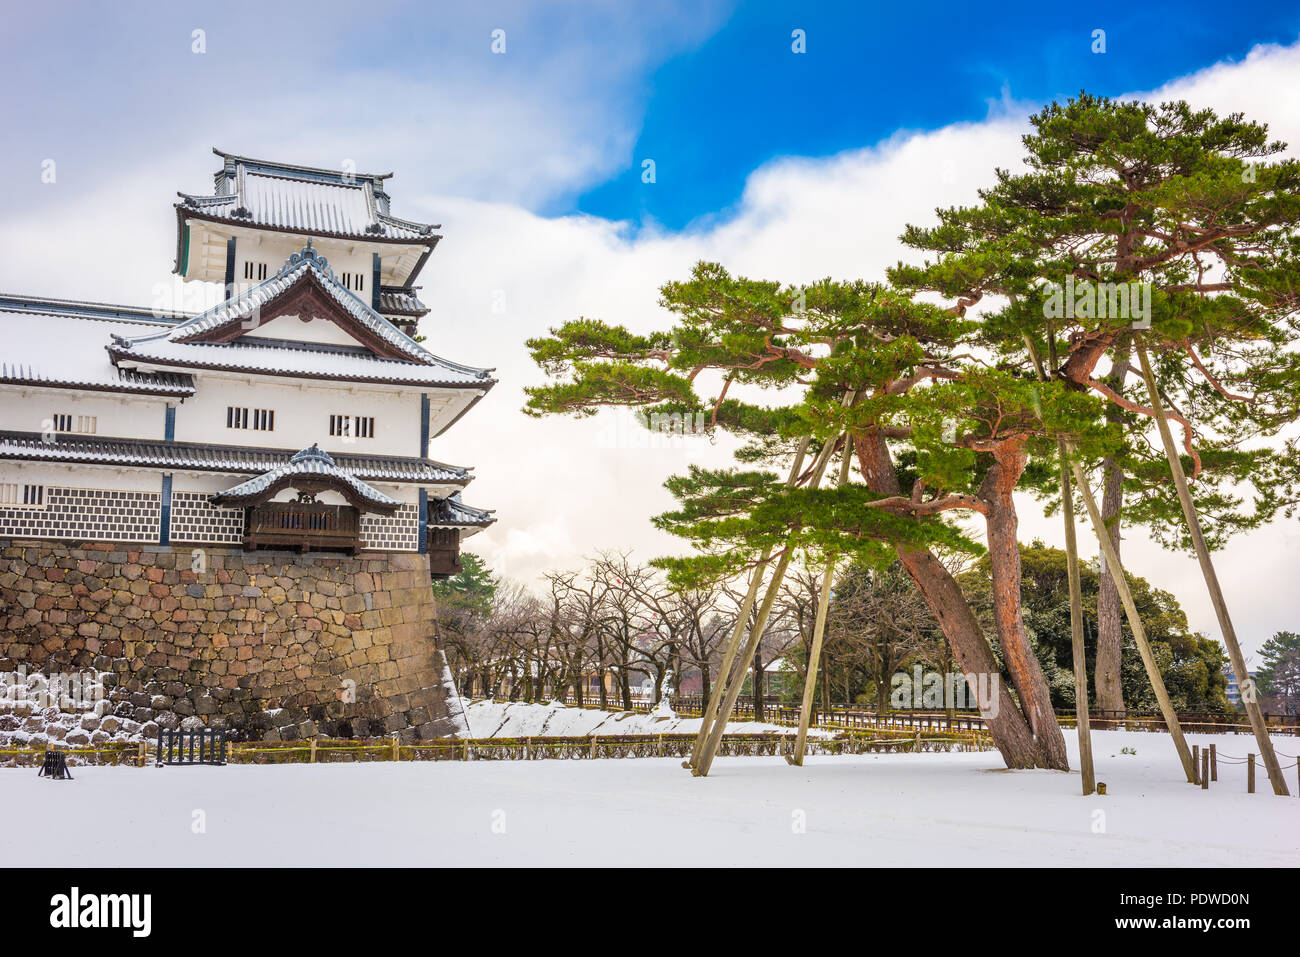 Kanazawa, Japan at the castle in wnter. - Stock Image